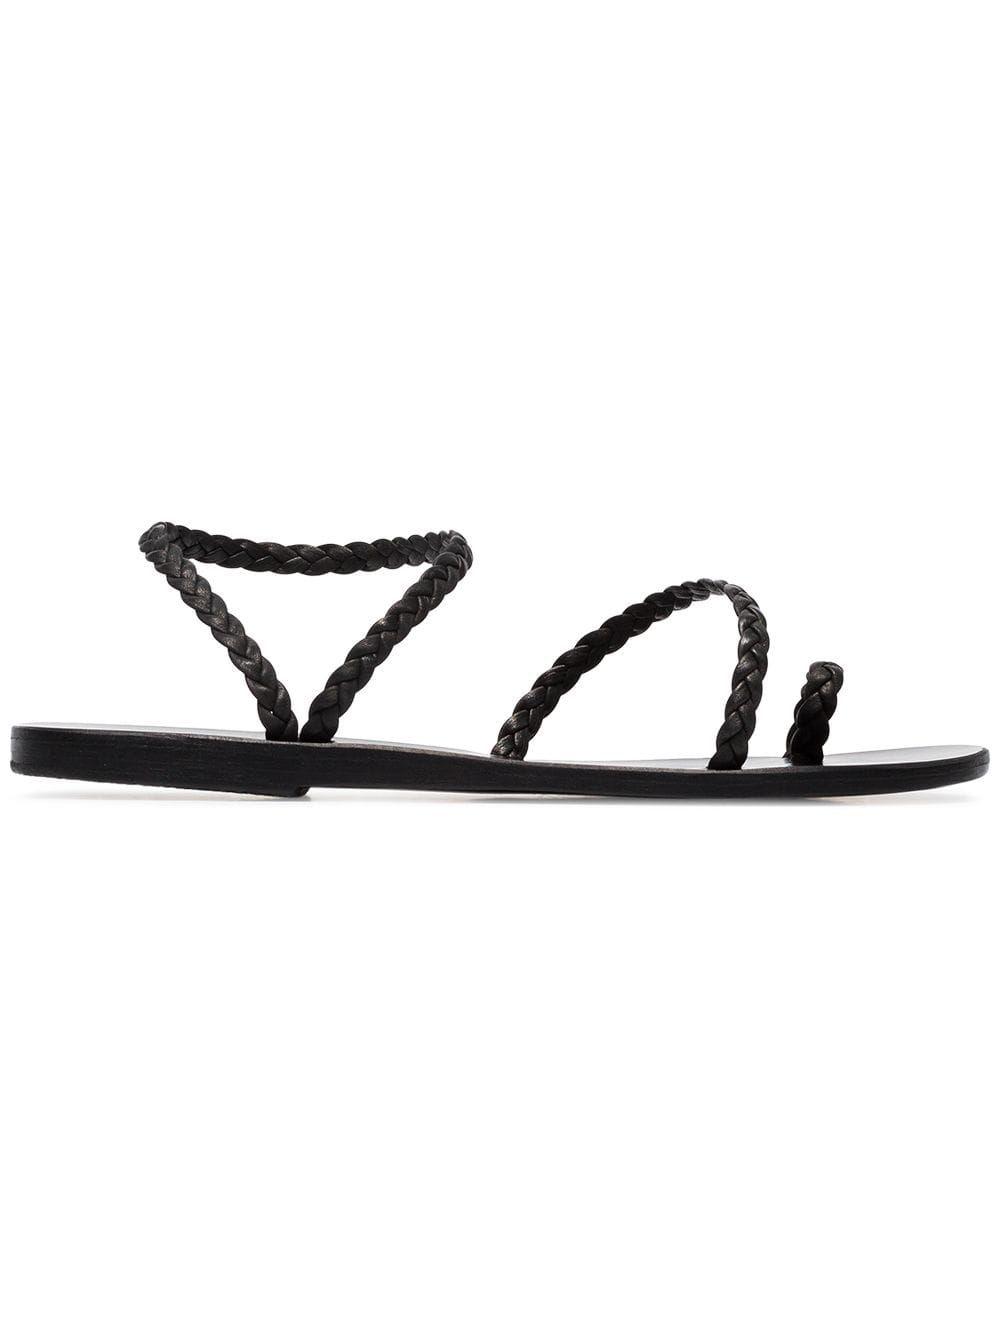 caf939c94abd Ancient Greek Sandals black elefteria braided leather sandals ...